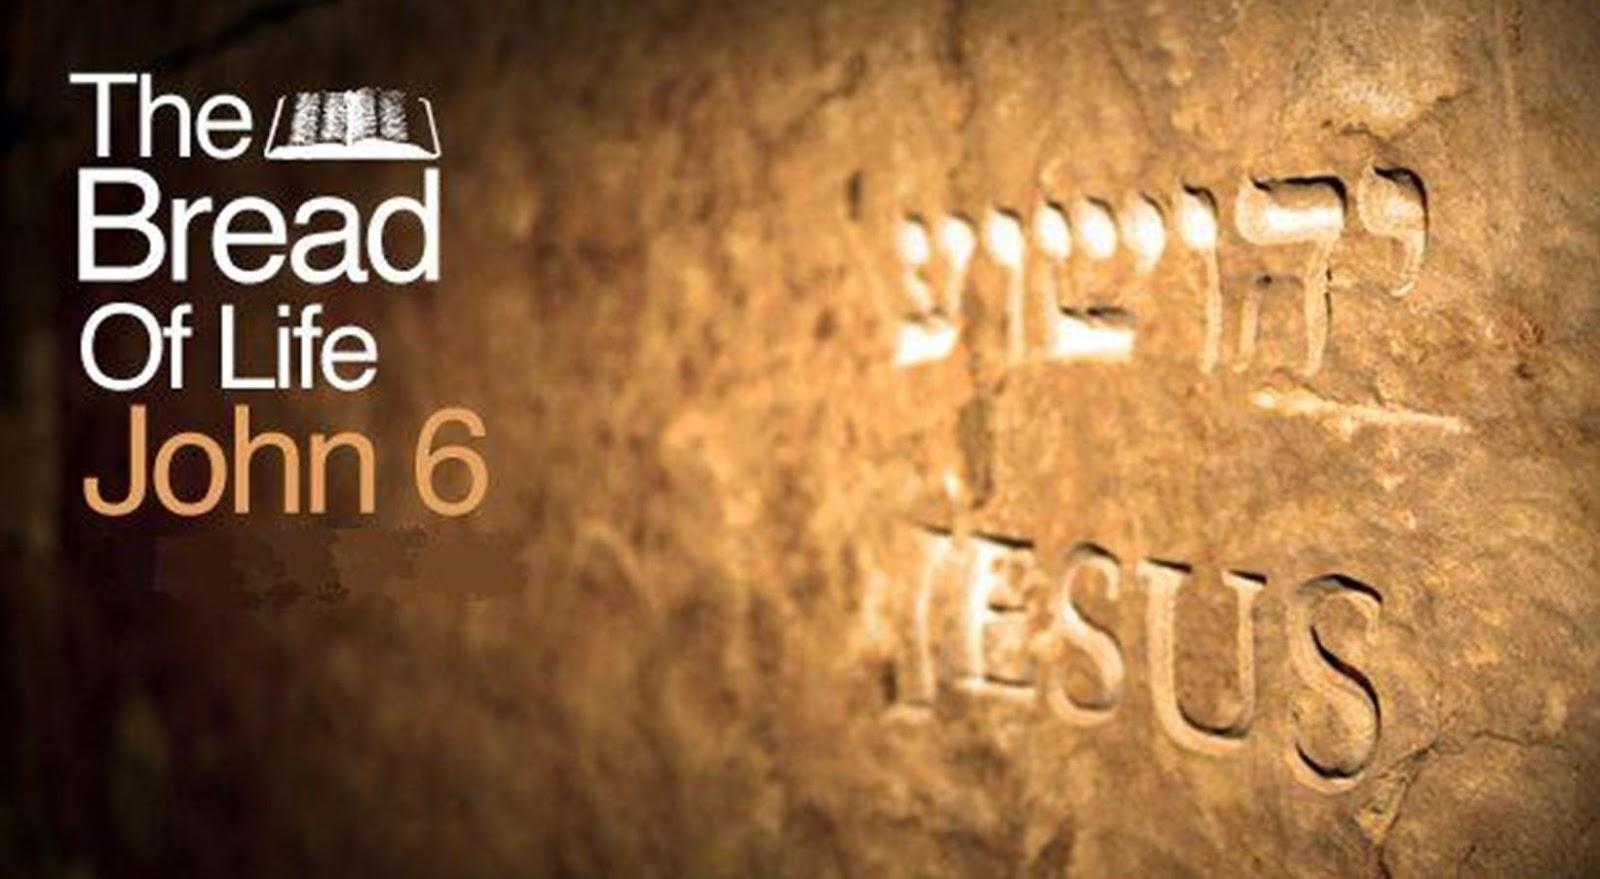 Jesus - The Bread of Life!